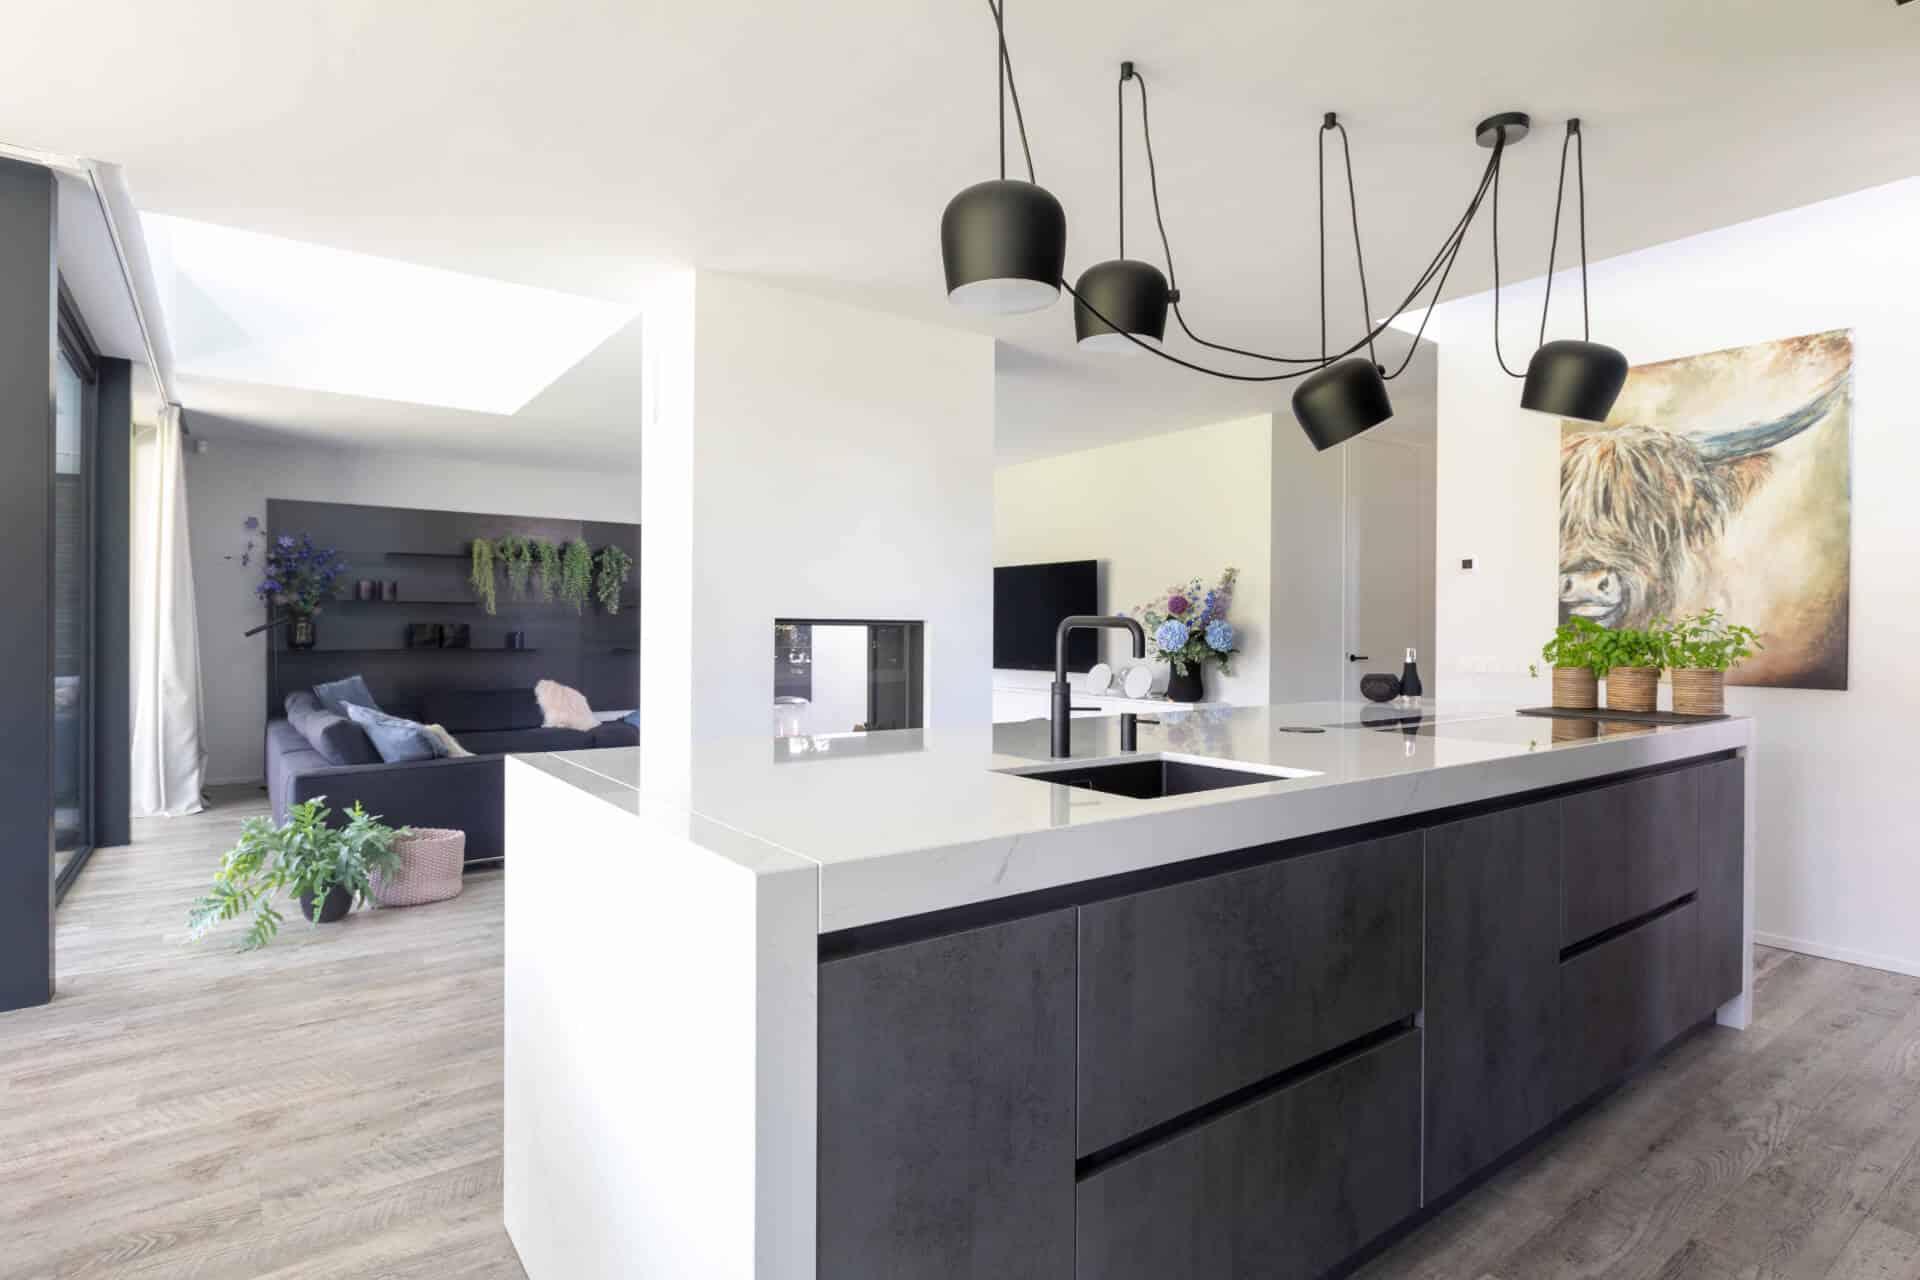 Luxe Design Keuken Lochem Van Ginkel Keukens Barneveld 023